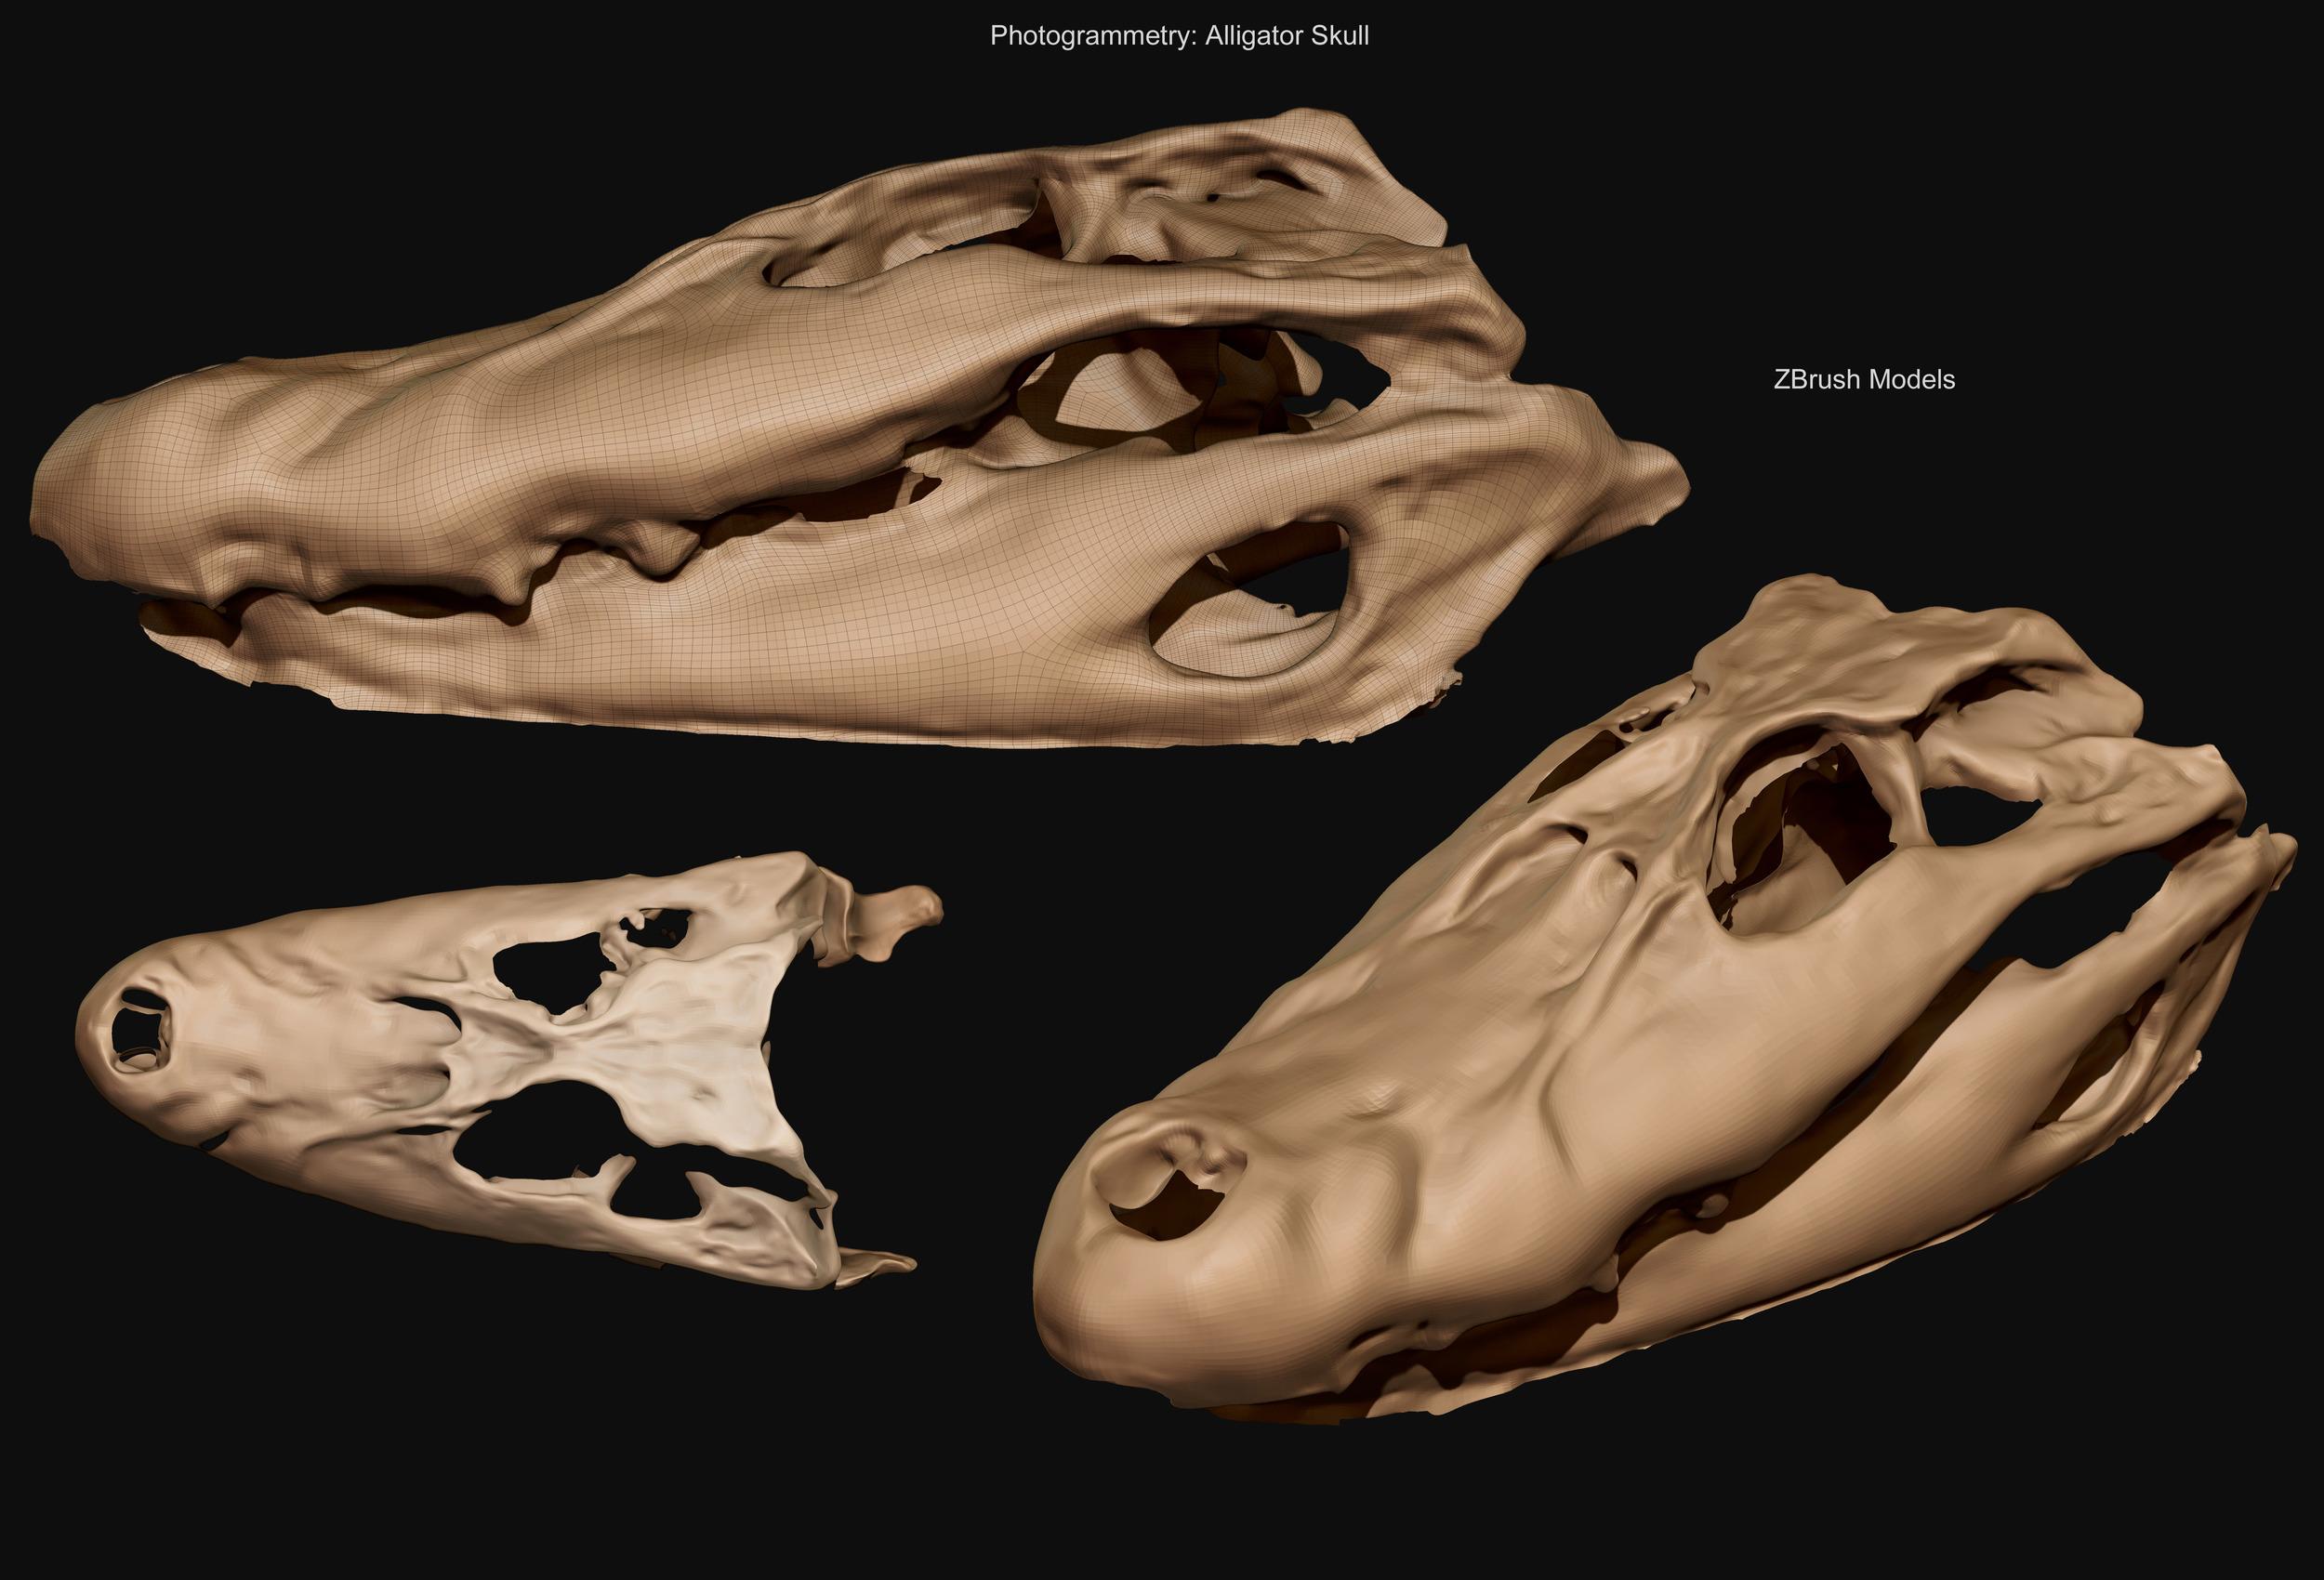 Alligator Skull - Final mesh - David McDonald